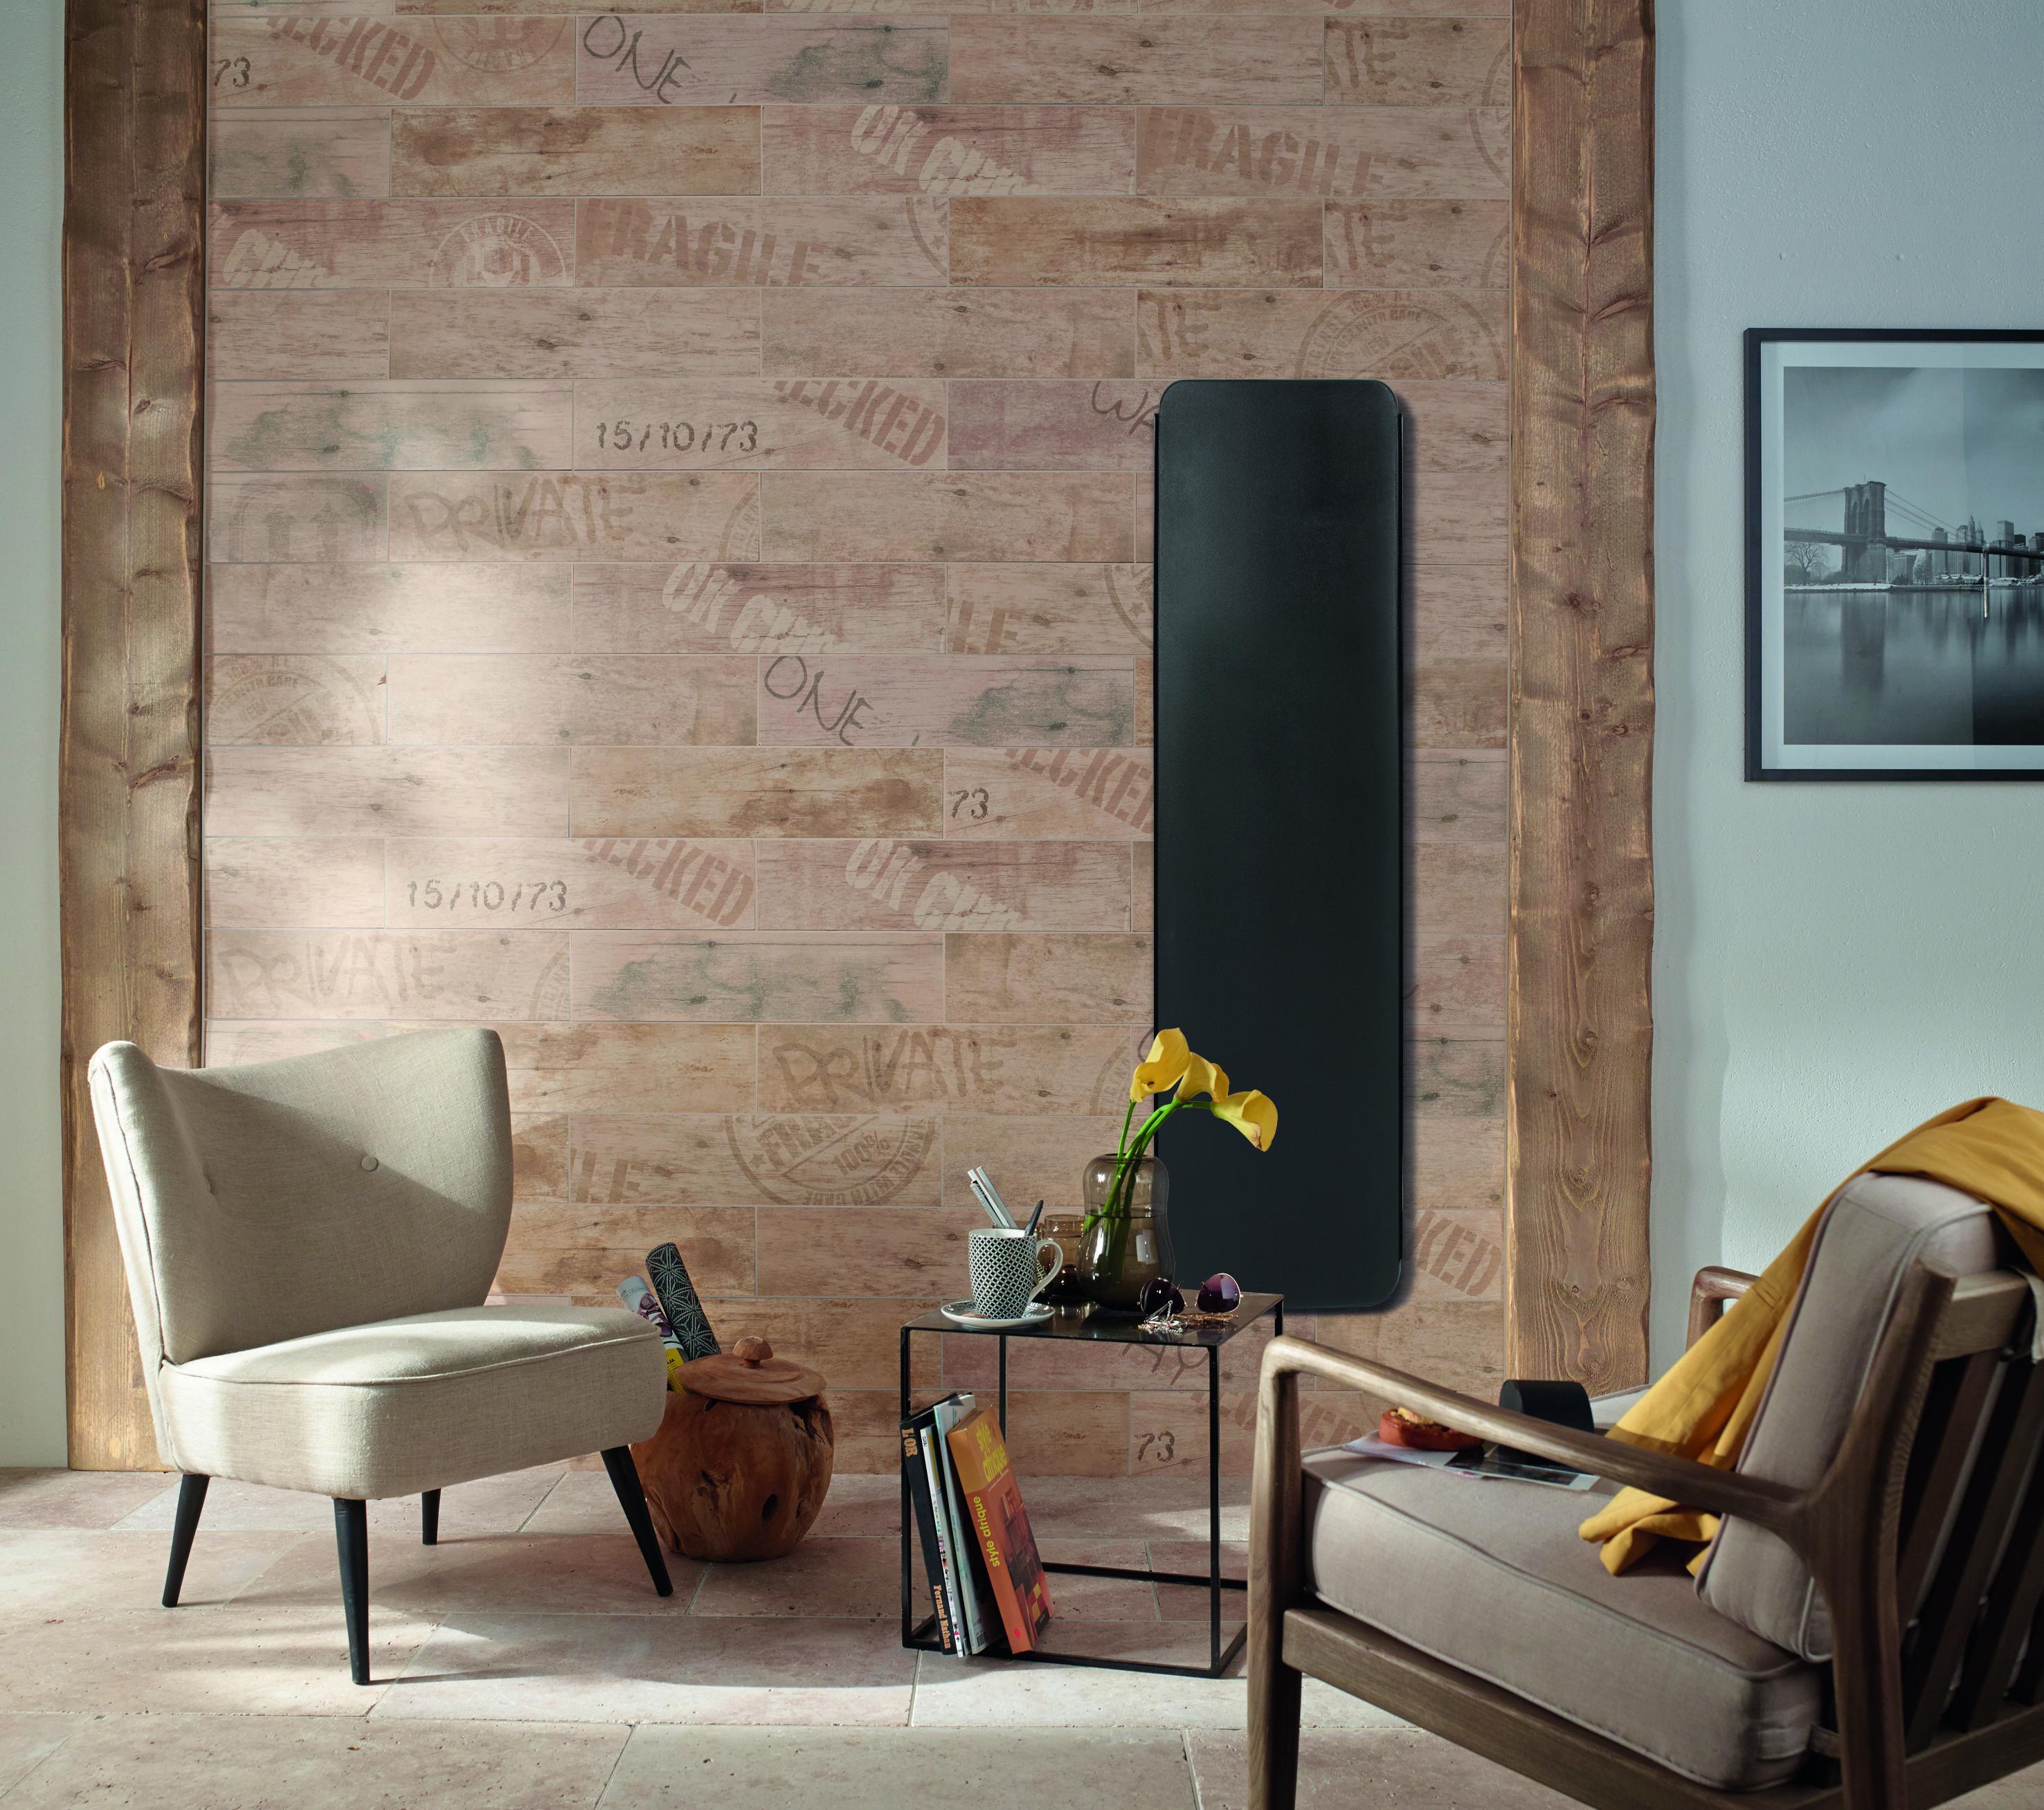 radiateurs electriques castorama amazing radiateurs electriques with radiateurs electriques. Black Bedroom Furniture Sets. Home Design Ideas